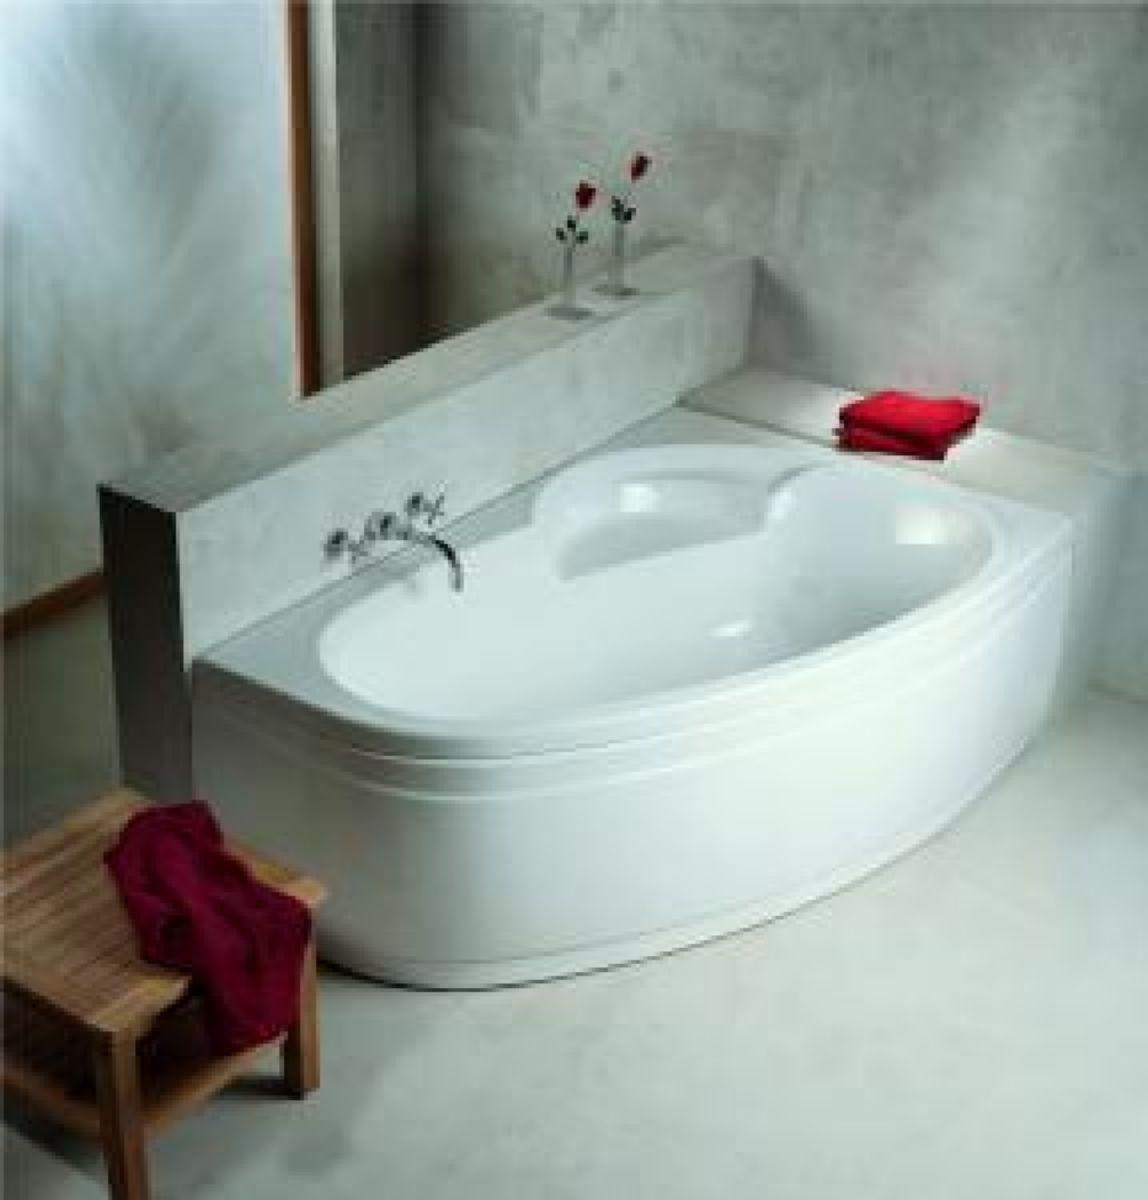 baignoire acrylique ou toplax baignoire acrylique ou toplax baignoire sylene allibert france. Black Bedroom Furniture Sets. Home Design Ideas